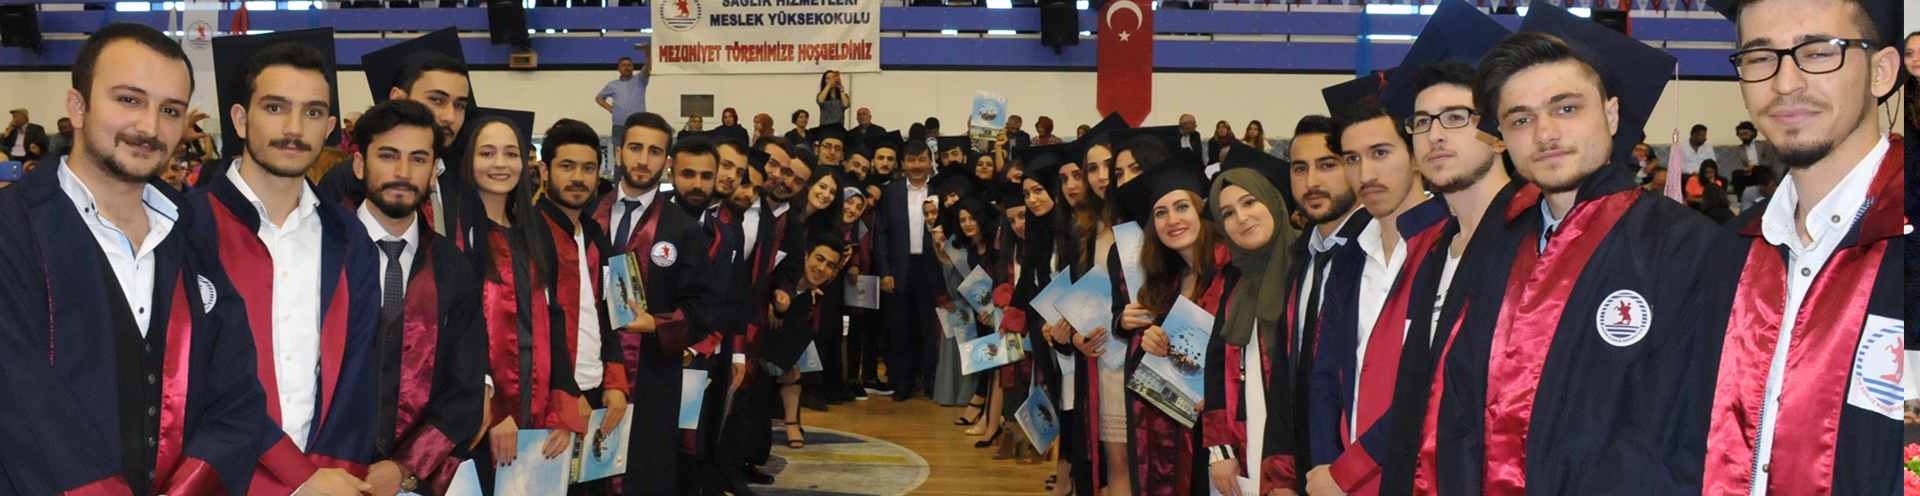 http://www.omu.edu.tr/sites/default/files/files/gelecegin_saglikcilari_mezun_oldu/saglimyodsc_0131.jpg